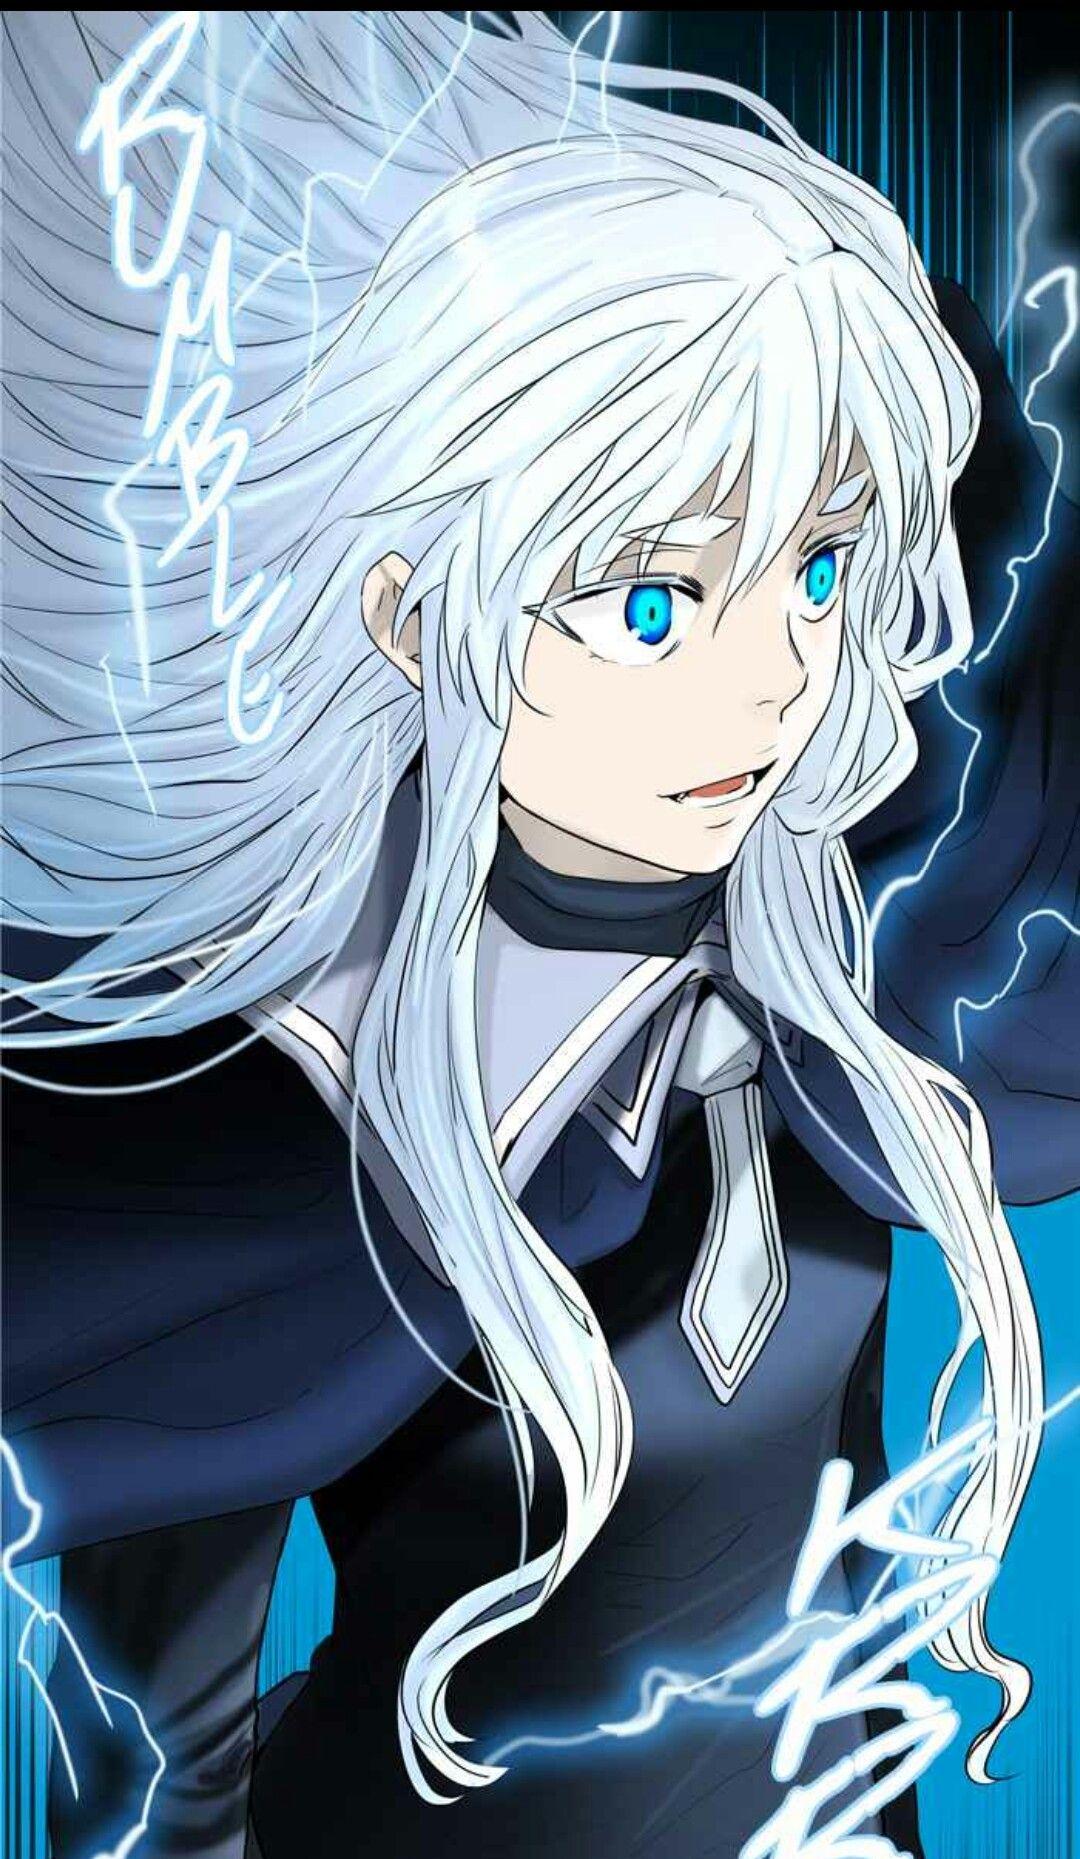 Pin by Kirā on [ WEBTOON ] (≧ ≦) Anime, Gods princess